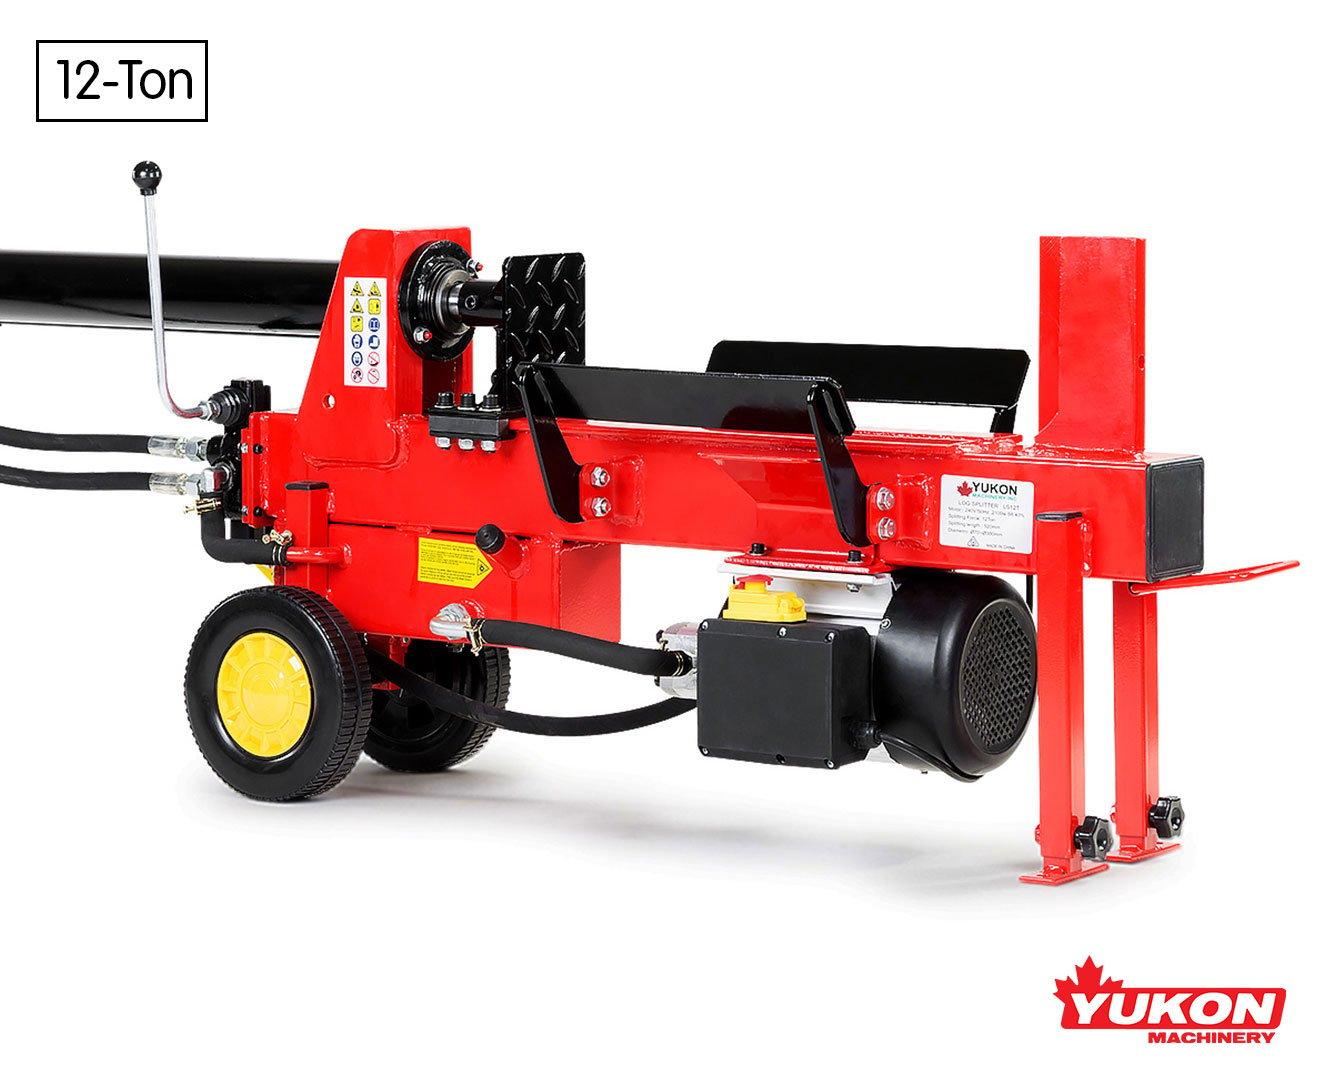 Yukon Electric 12 Ton Log Splitter Wood Cutter